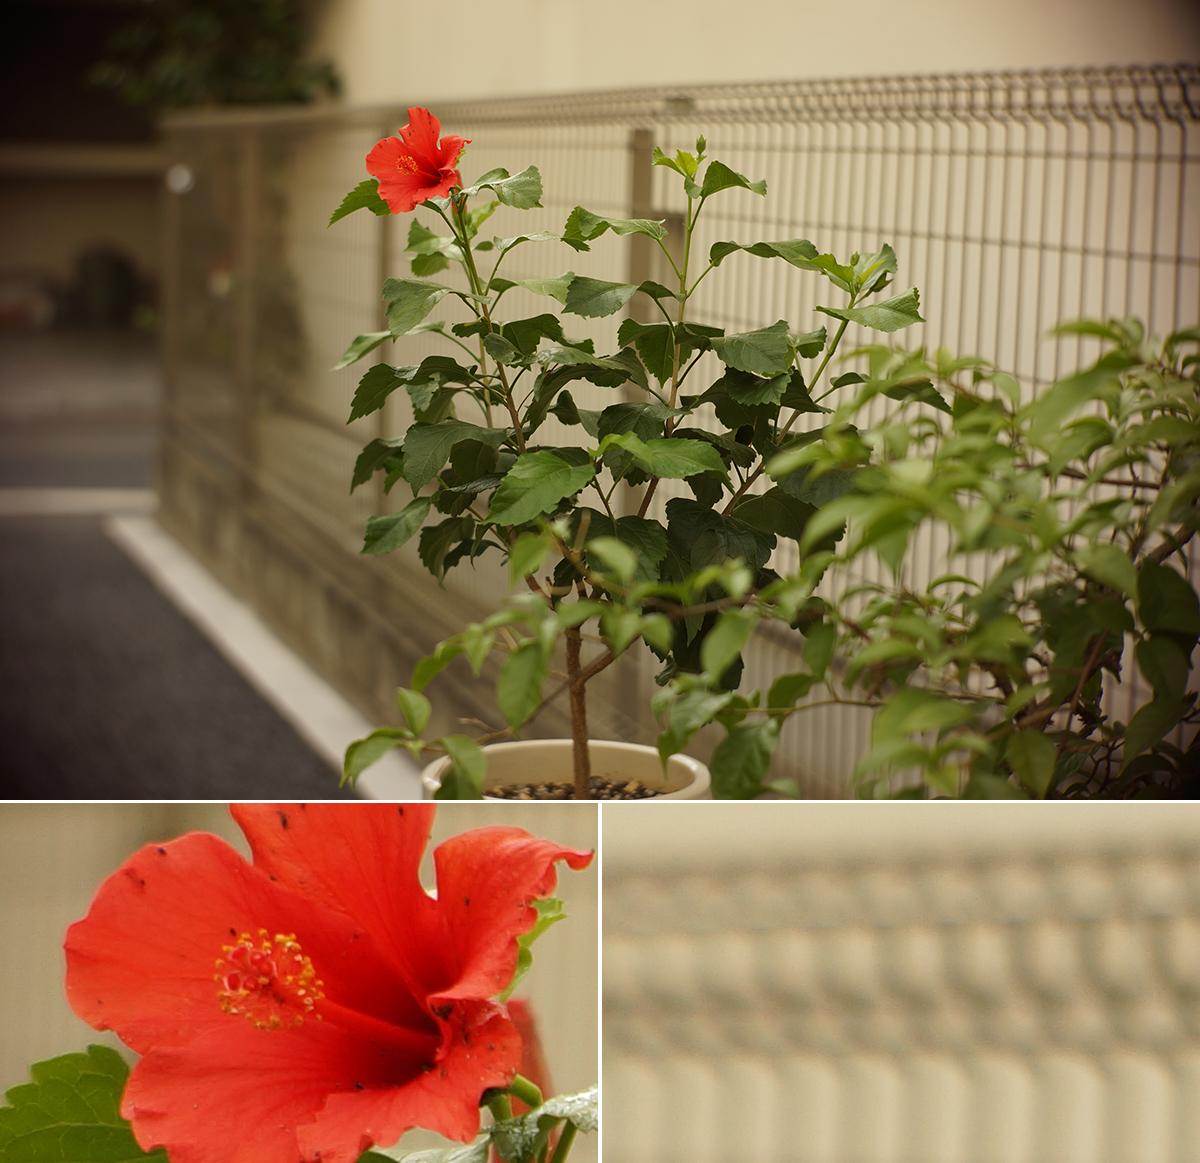 50mm_003_002_4985